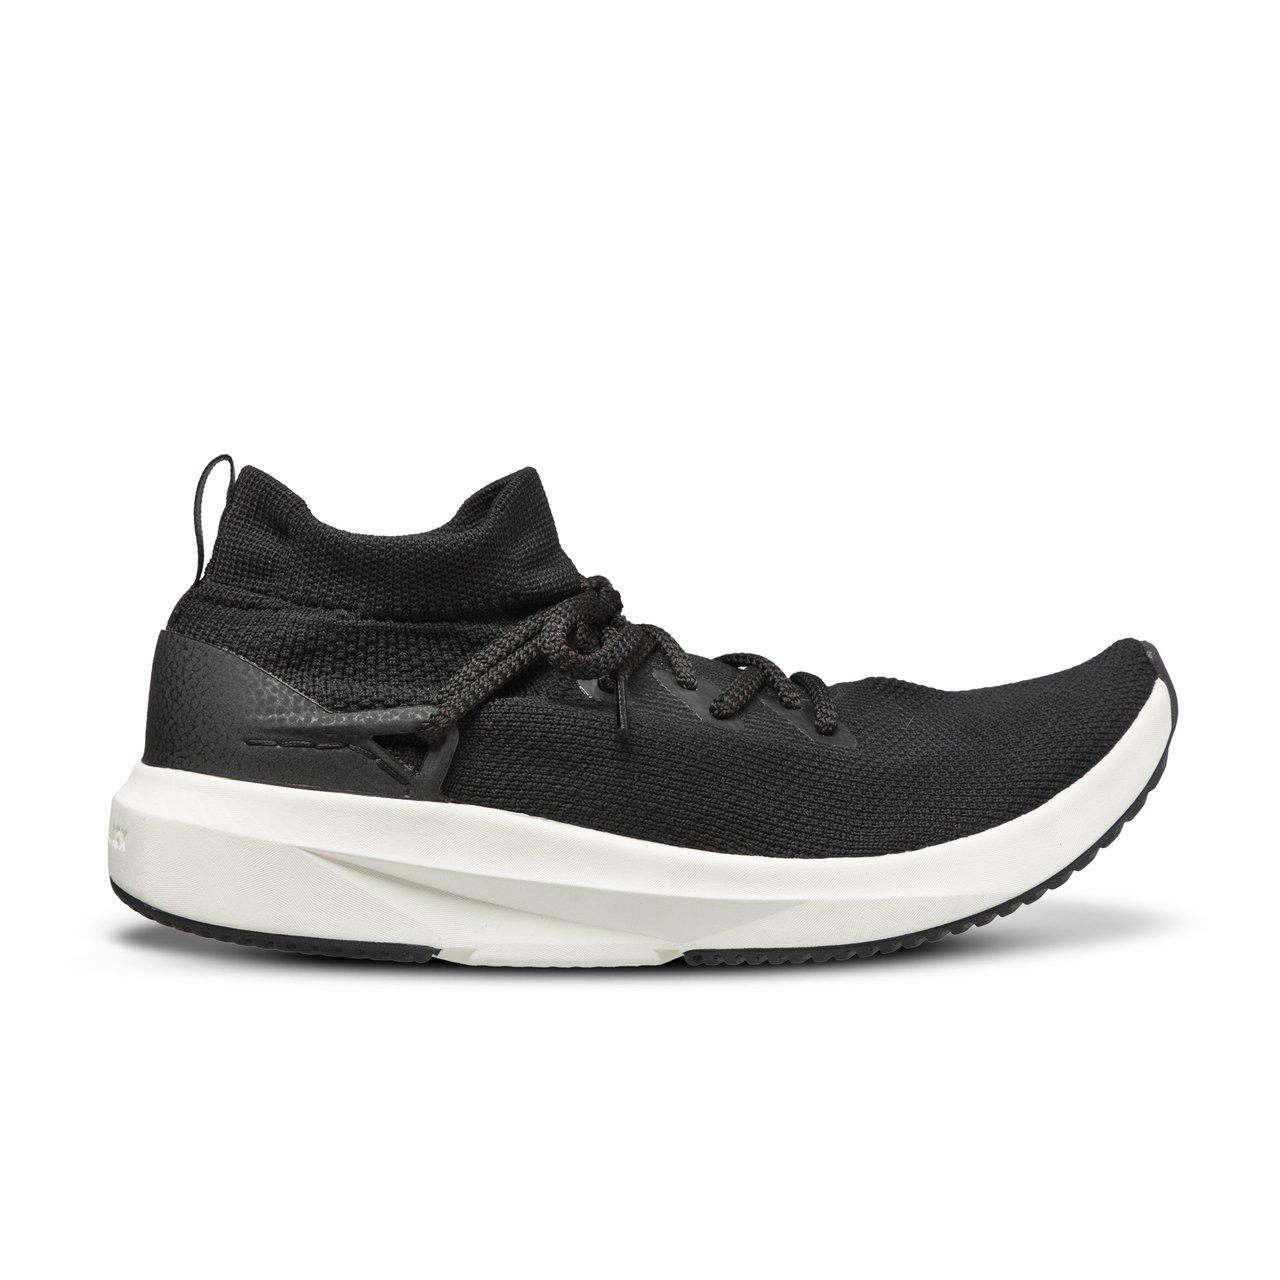 1280x1280 Footwear Brandblack